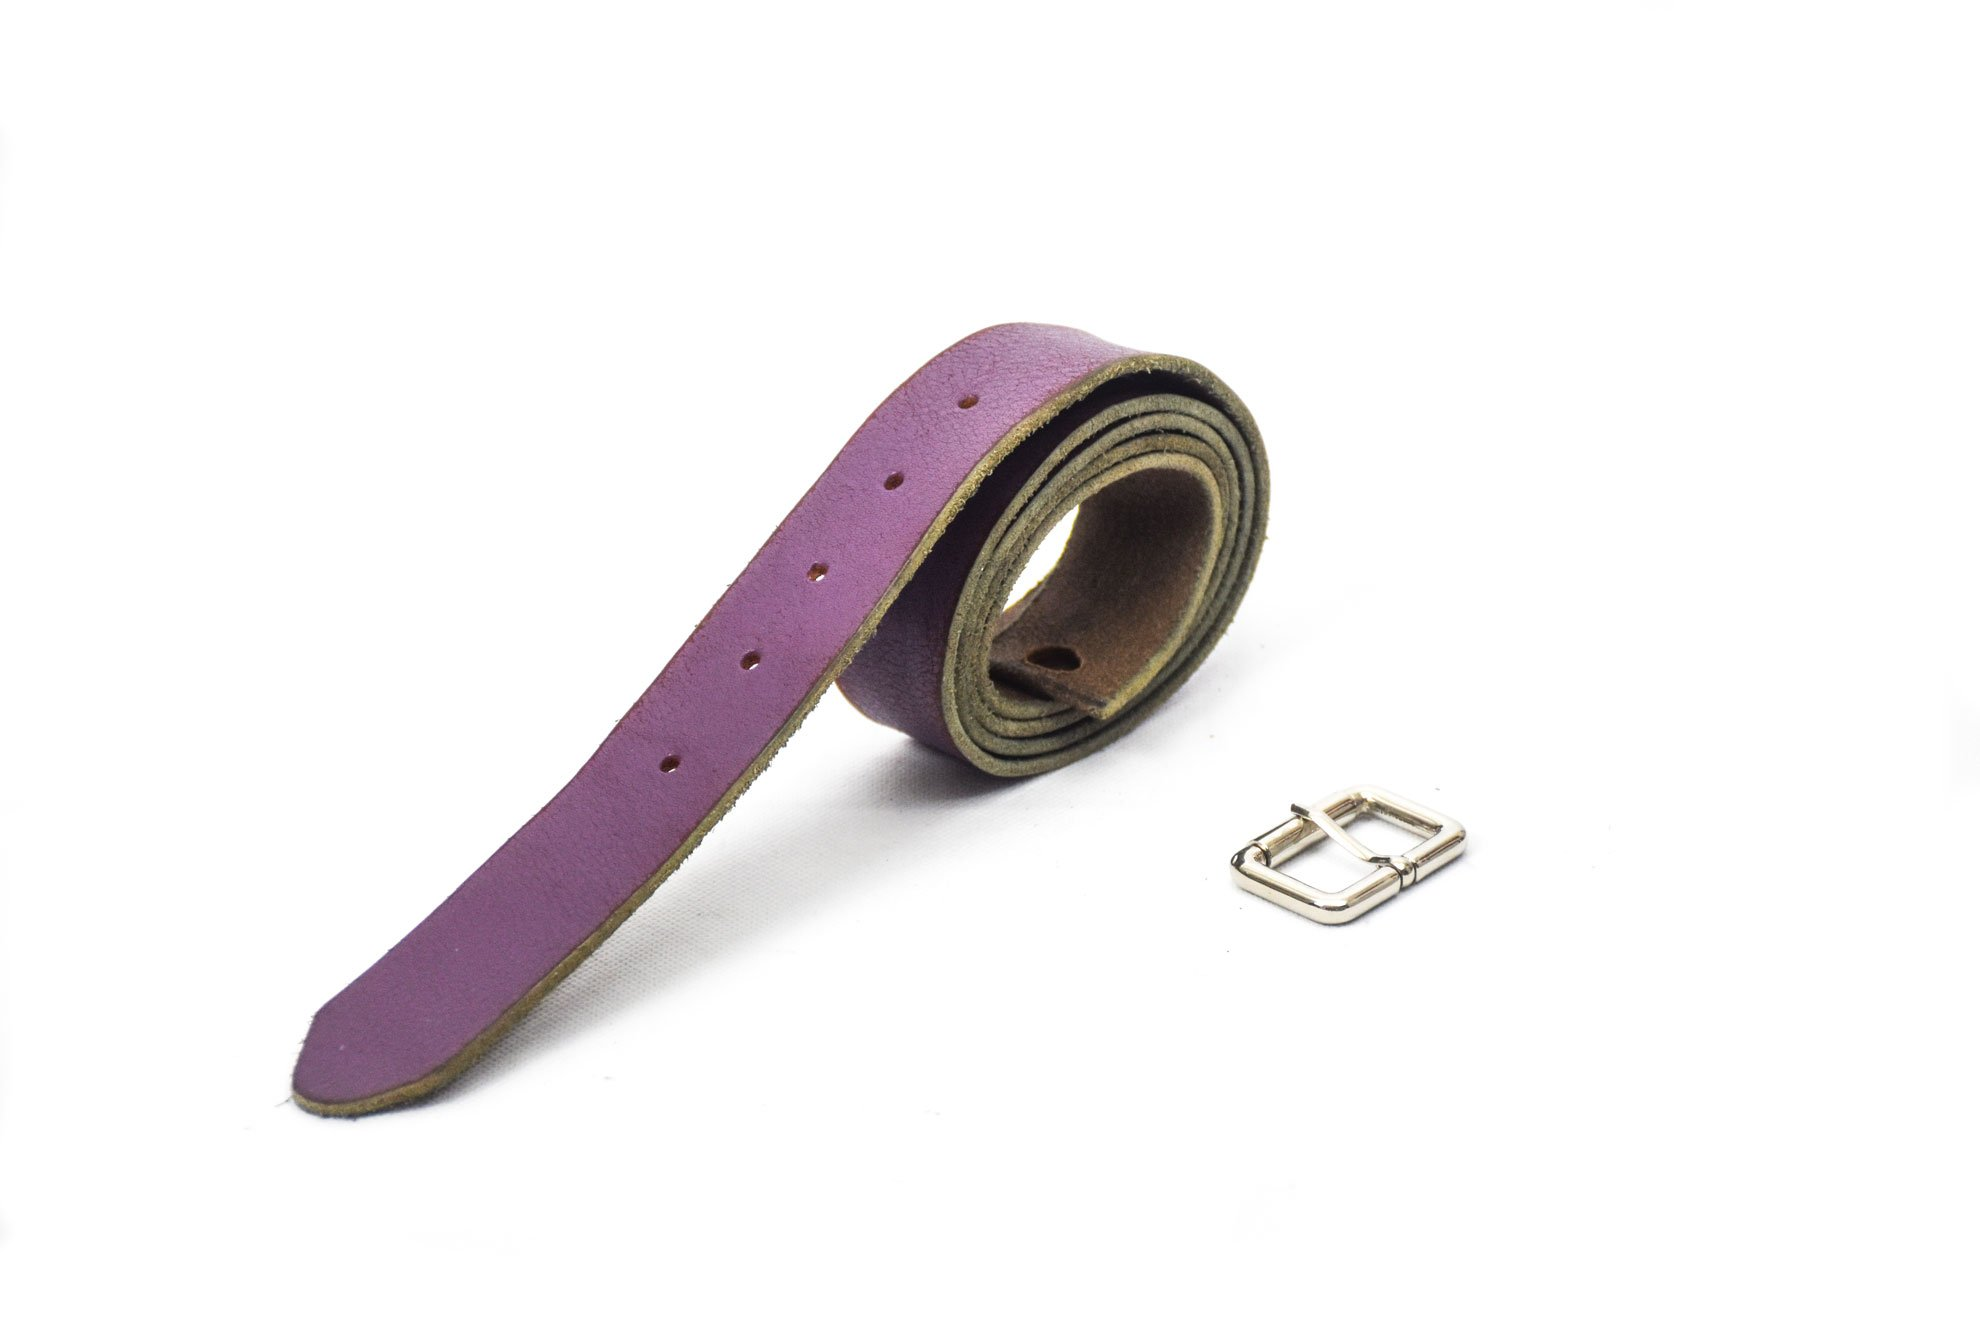 cinturon ancho 3.5cm violeta piel cuero belt unisex